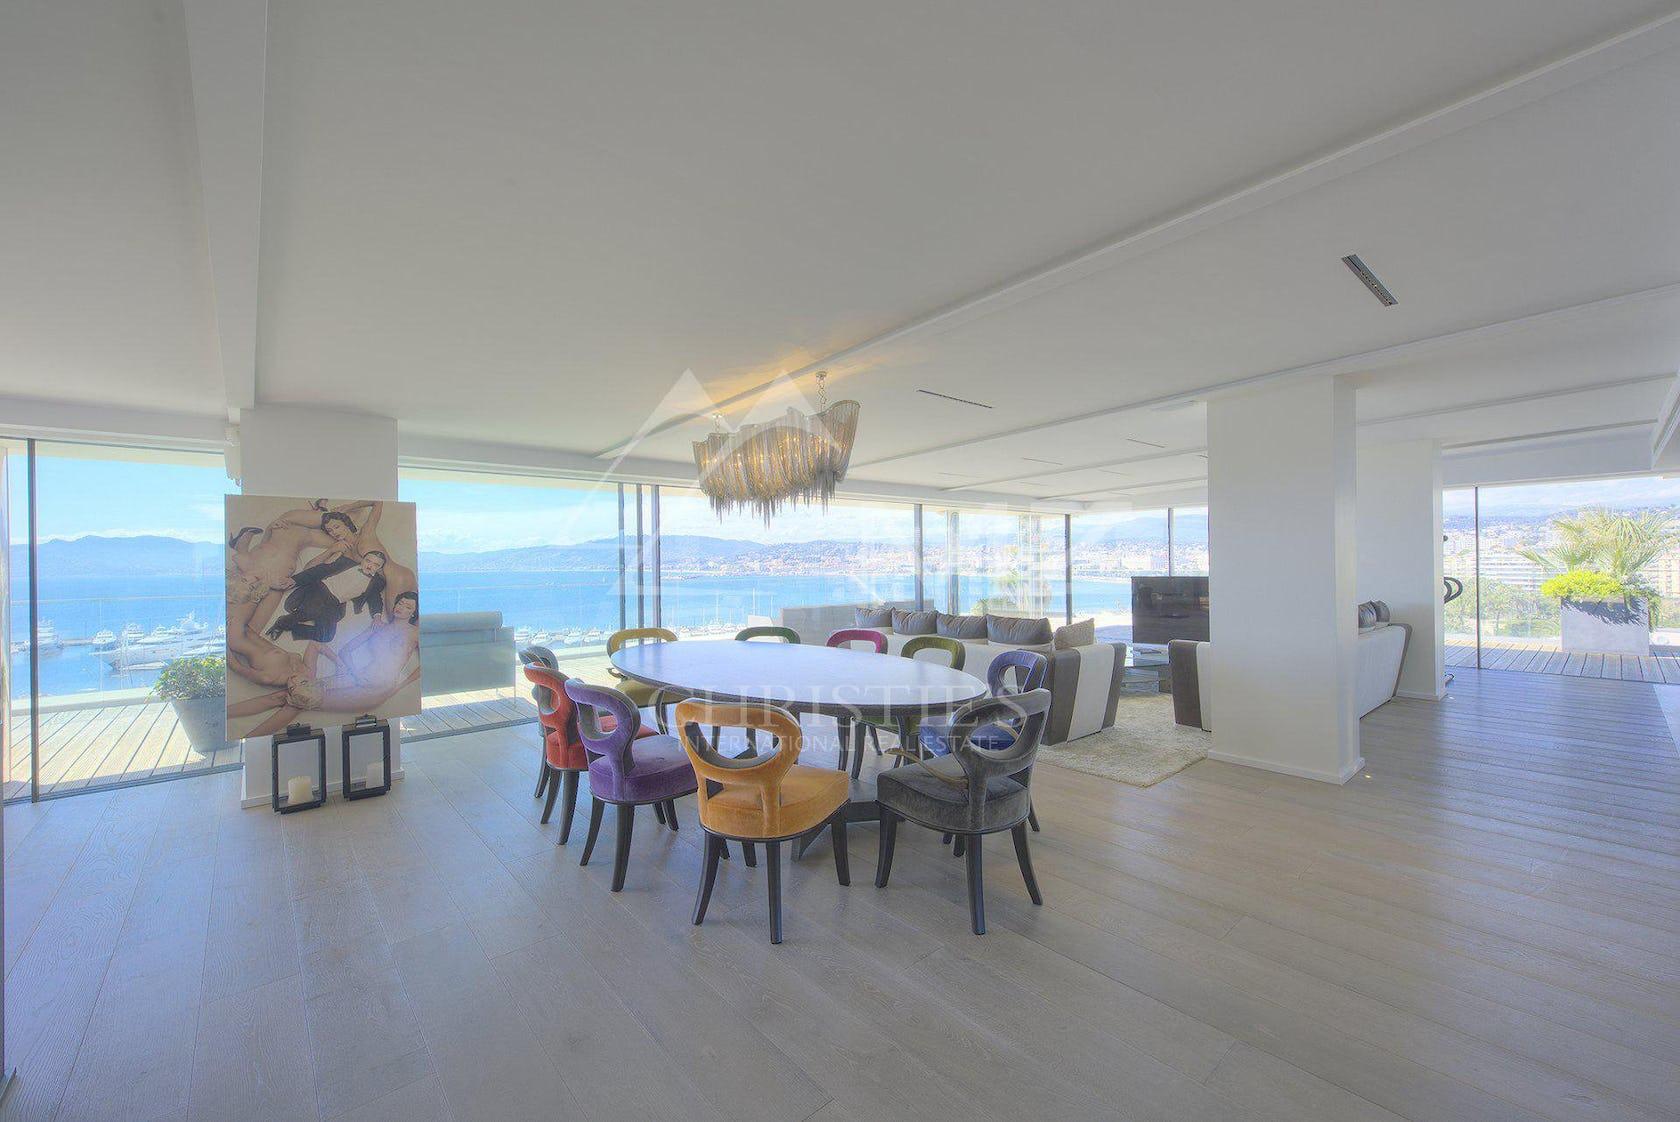 flooring chair floor wood hardwood interior design indoors housing plywood